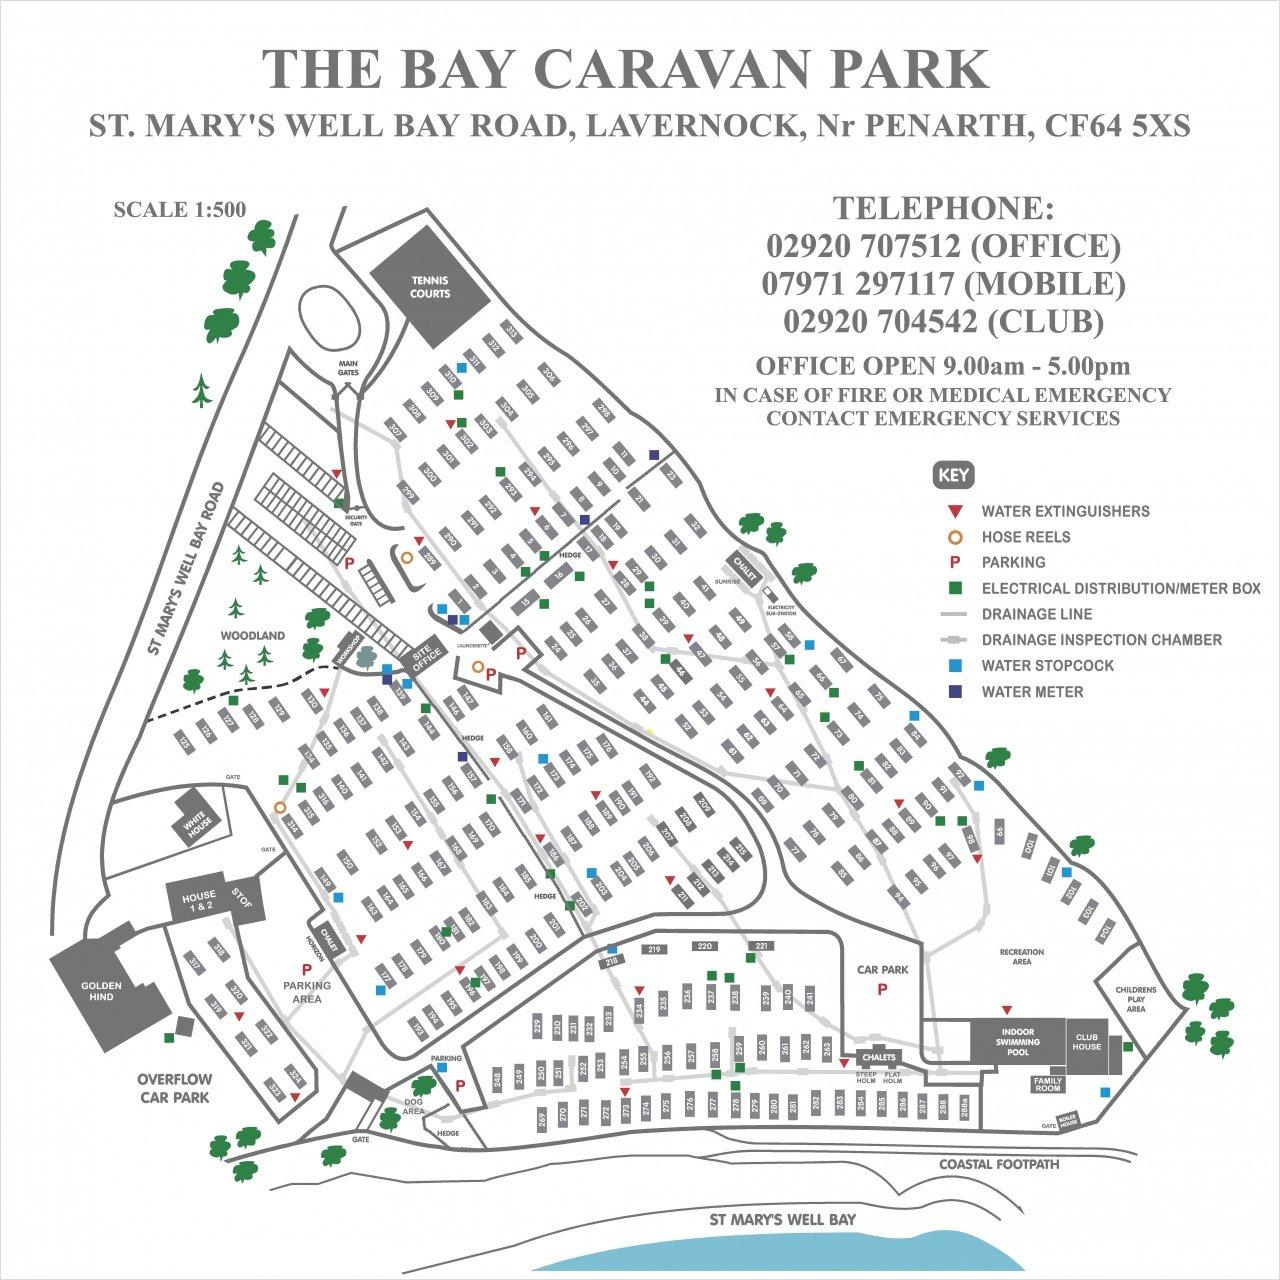 The Bay Caravan Park